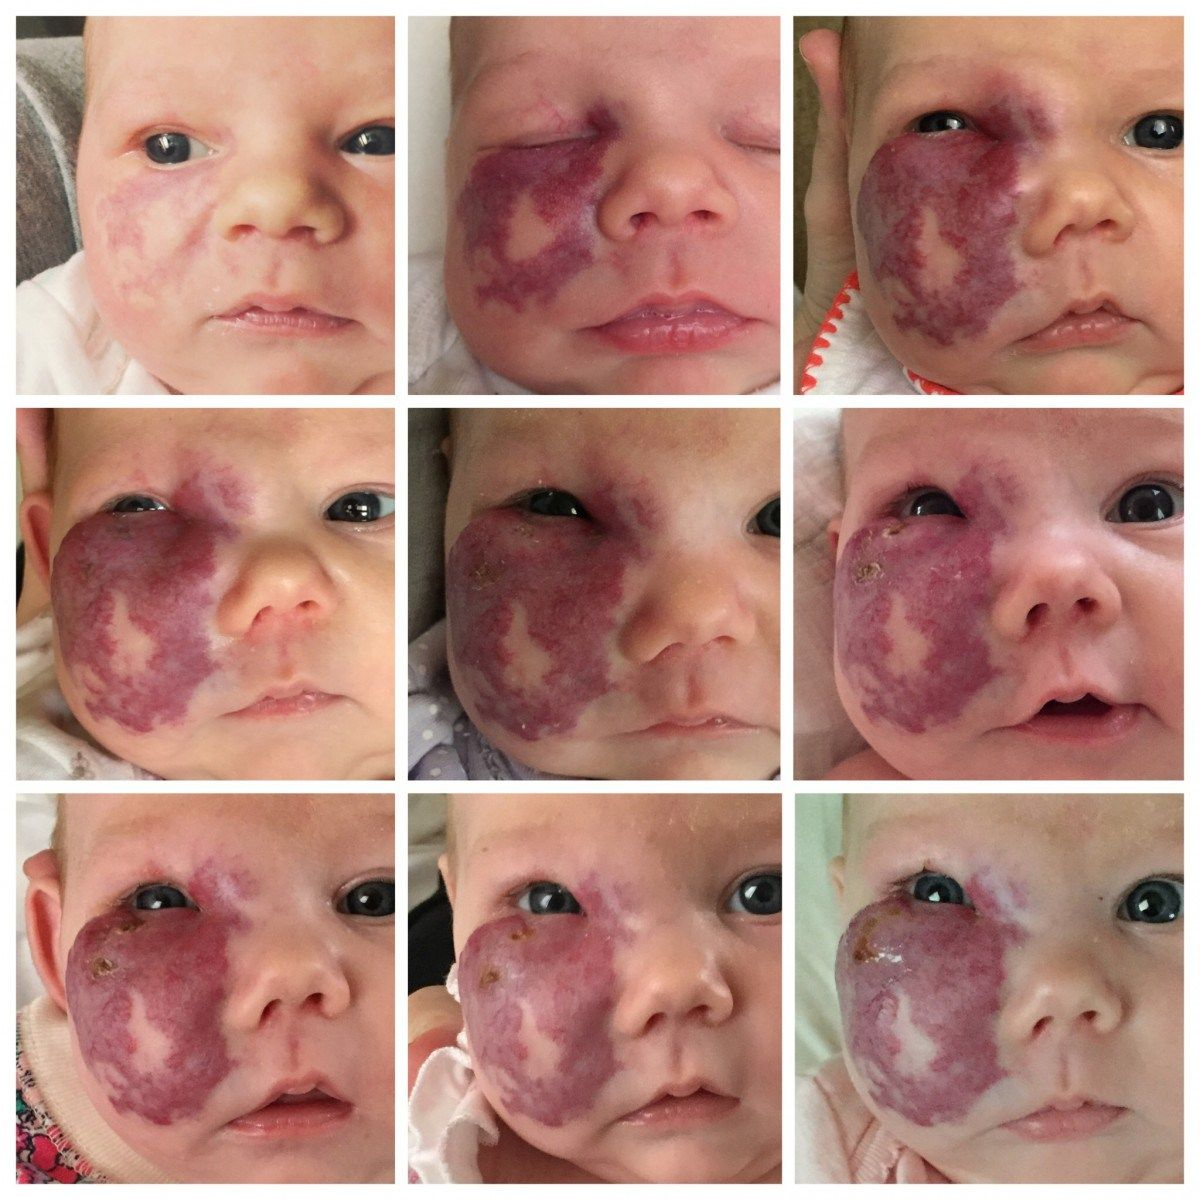 Hemangioma in a newborn